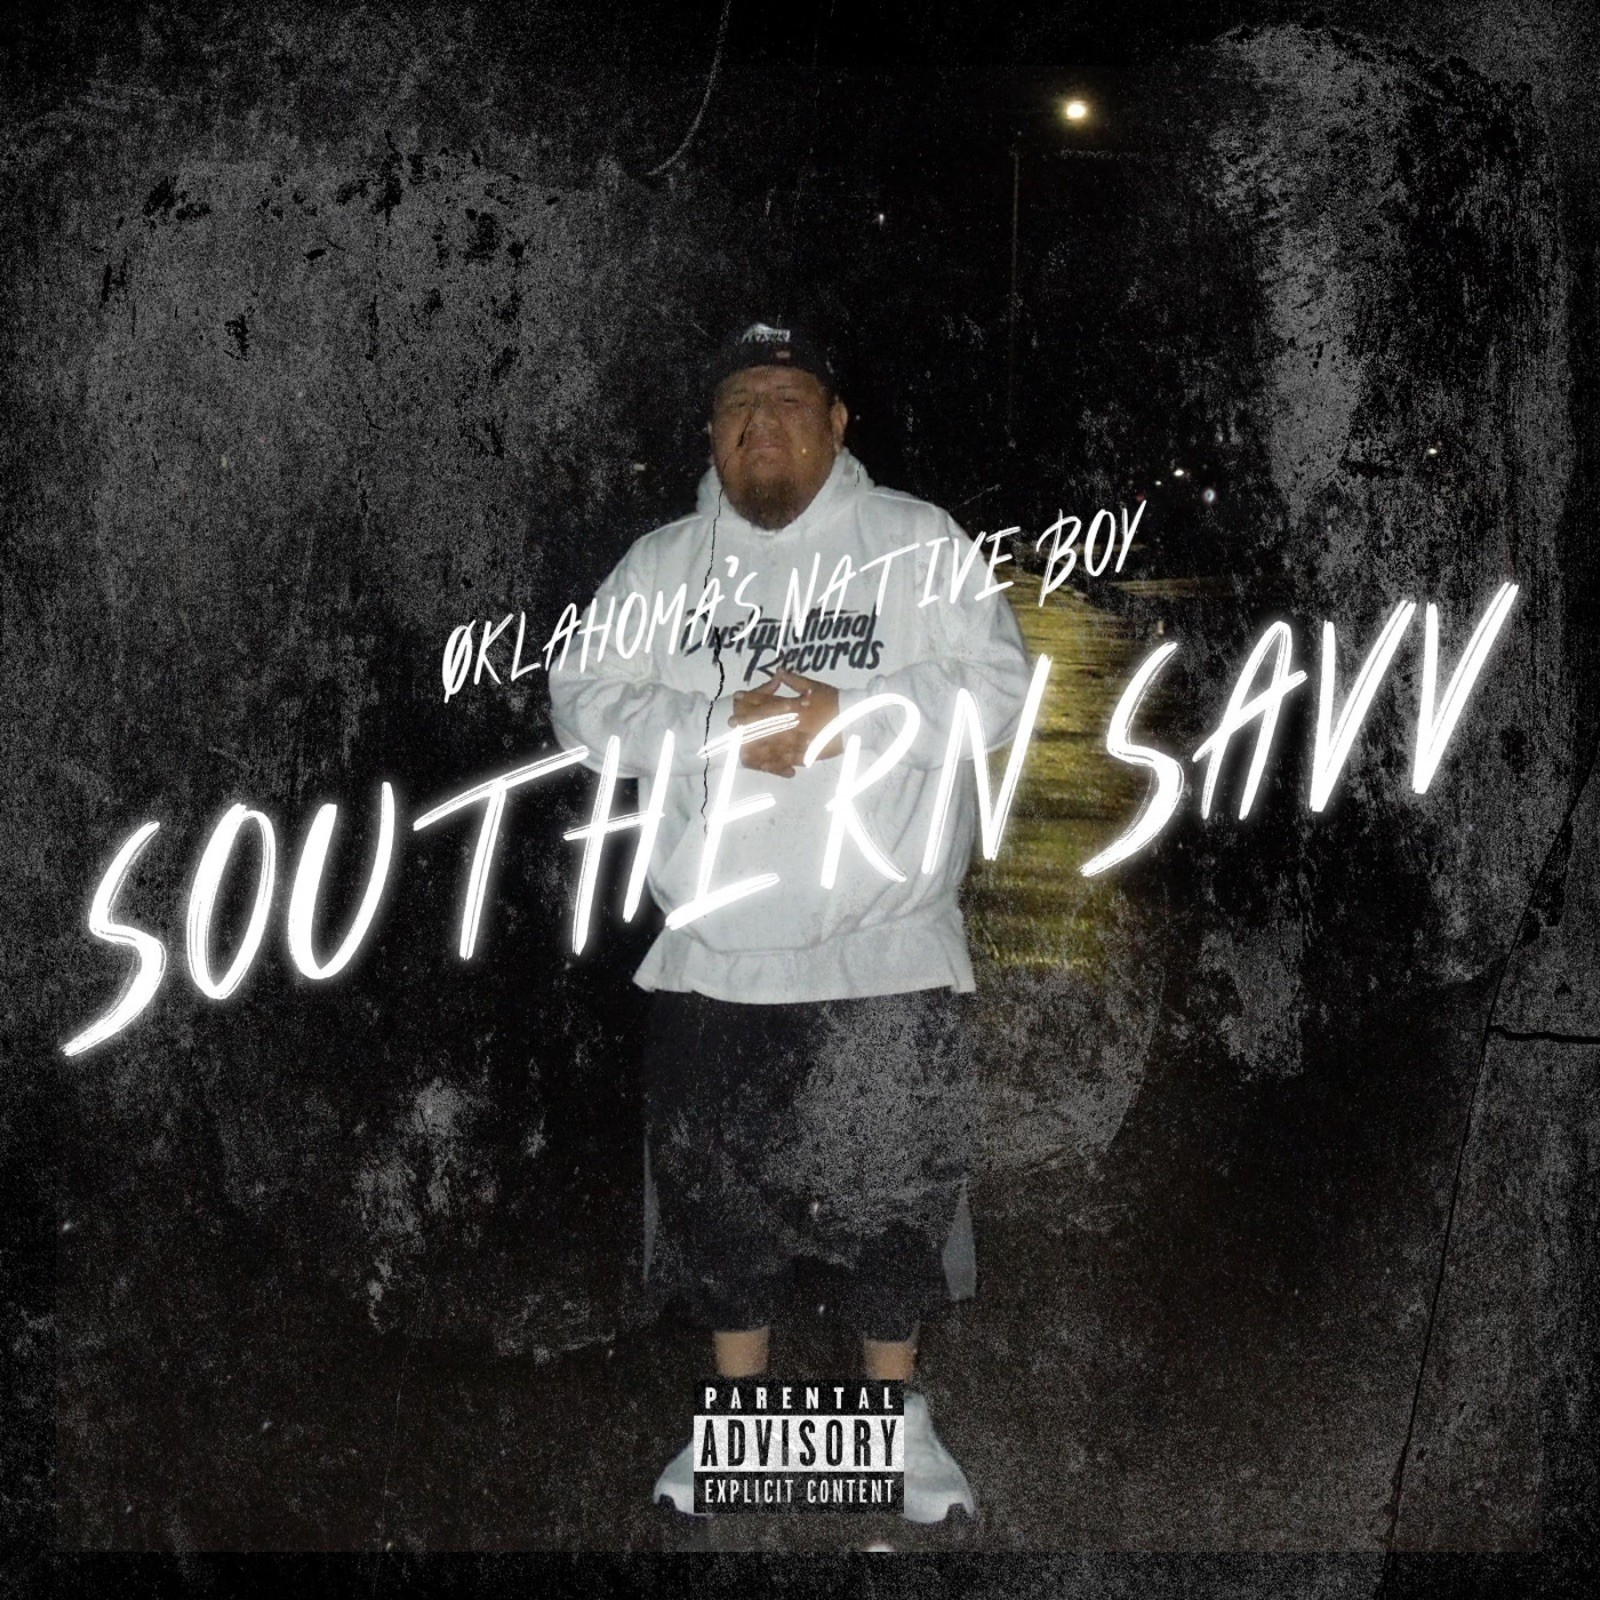 Southern Savv